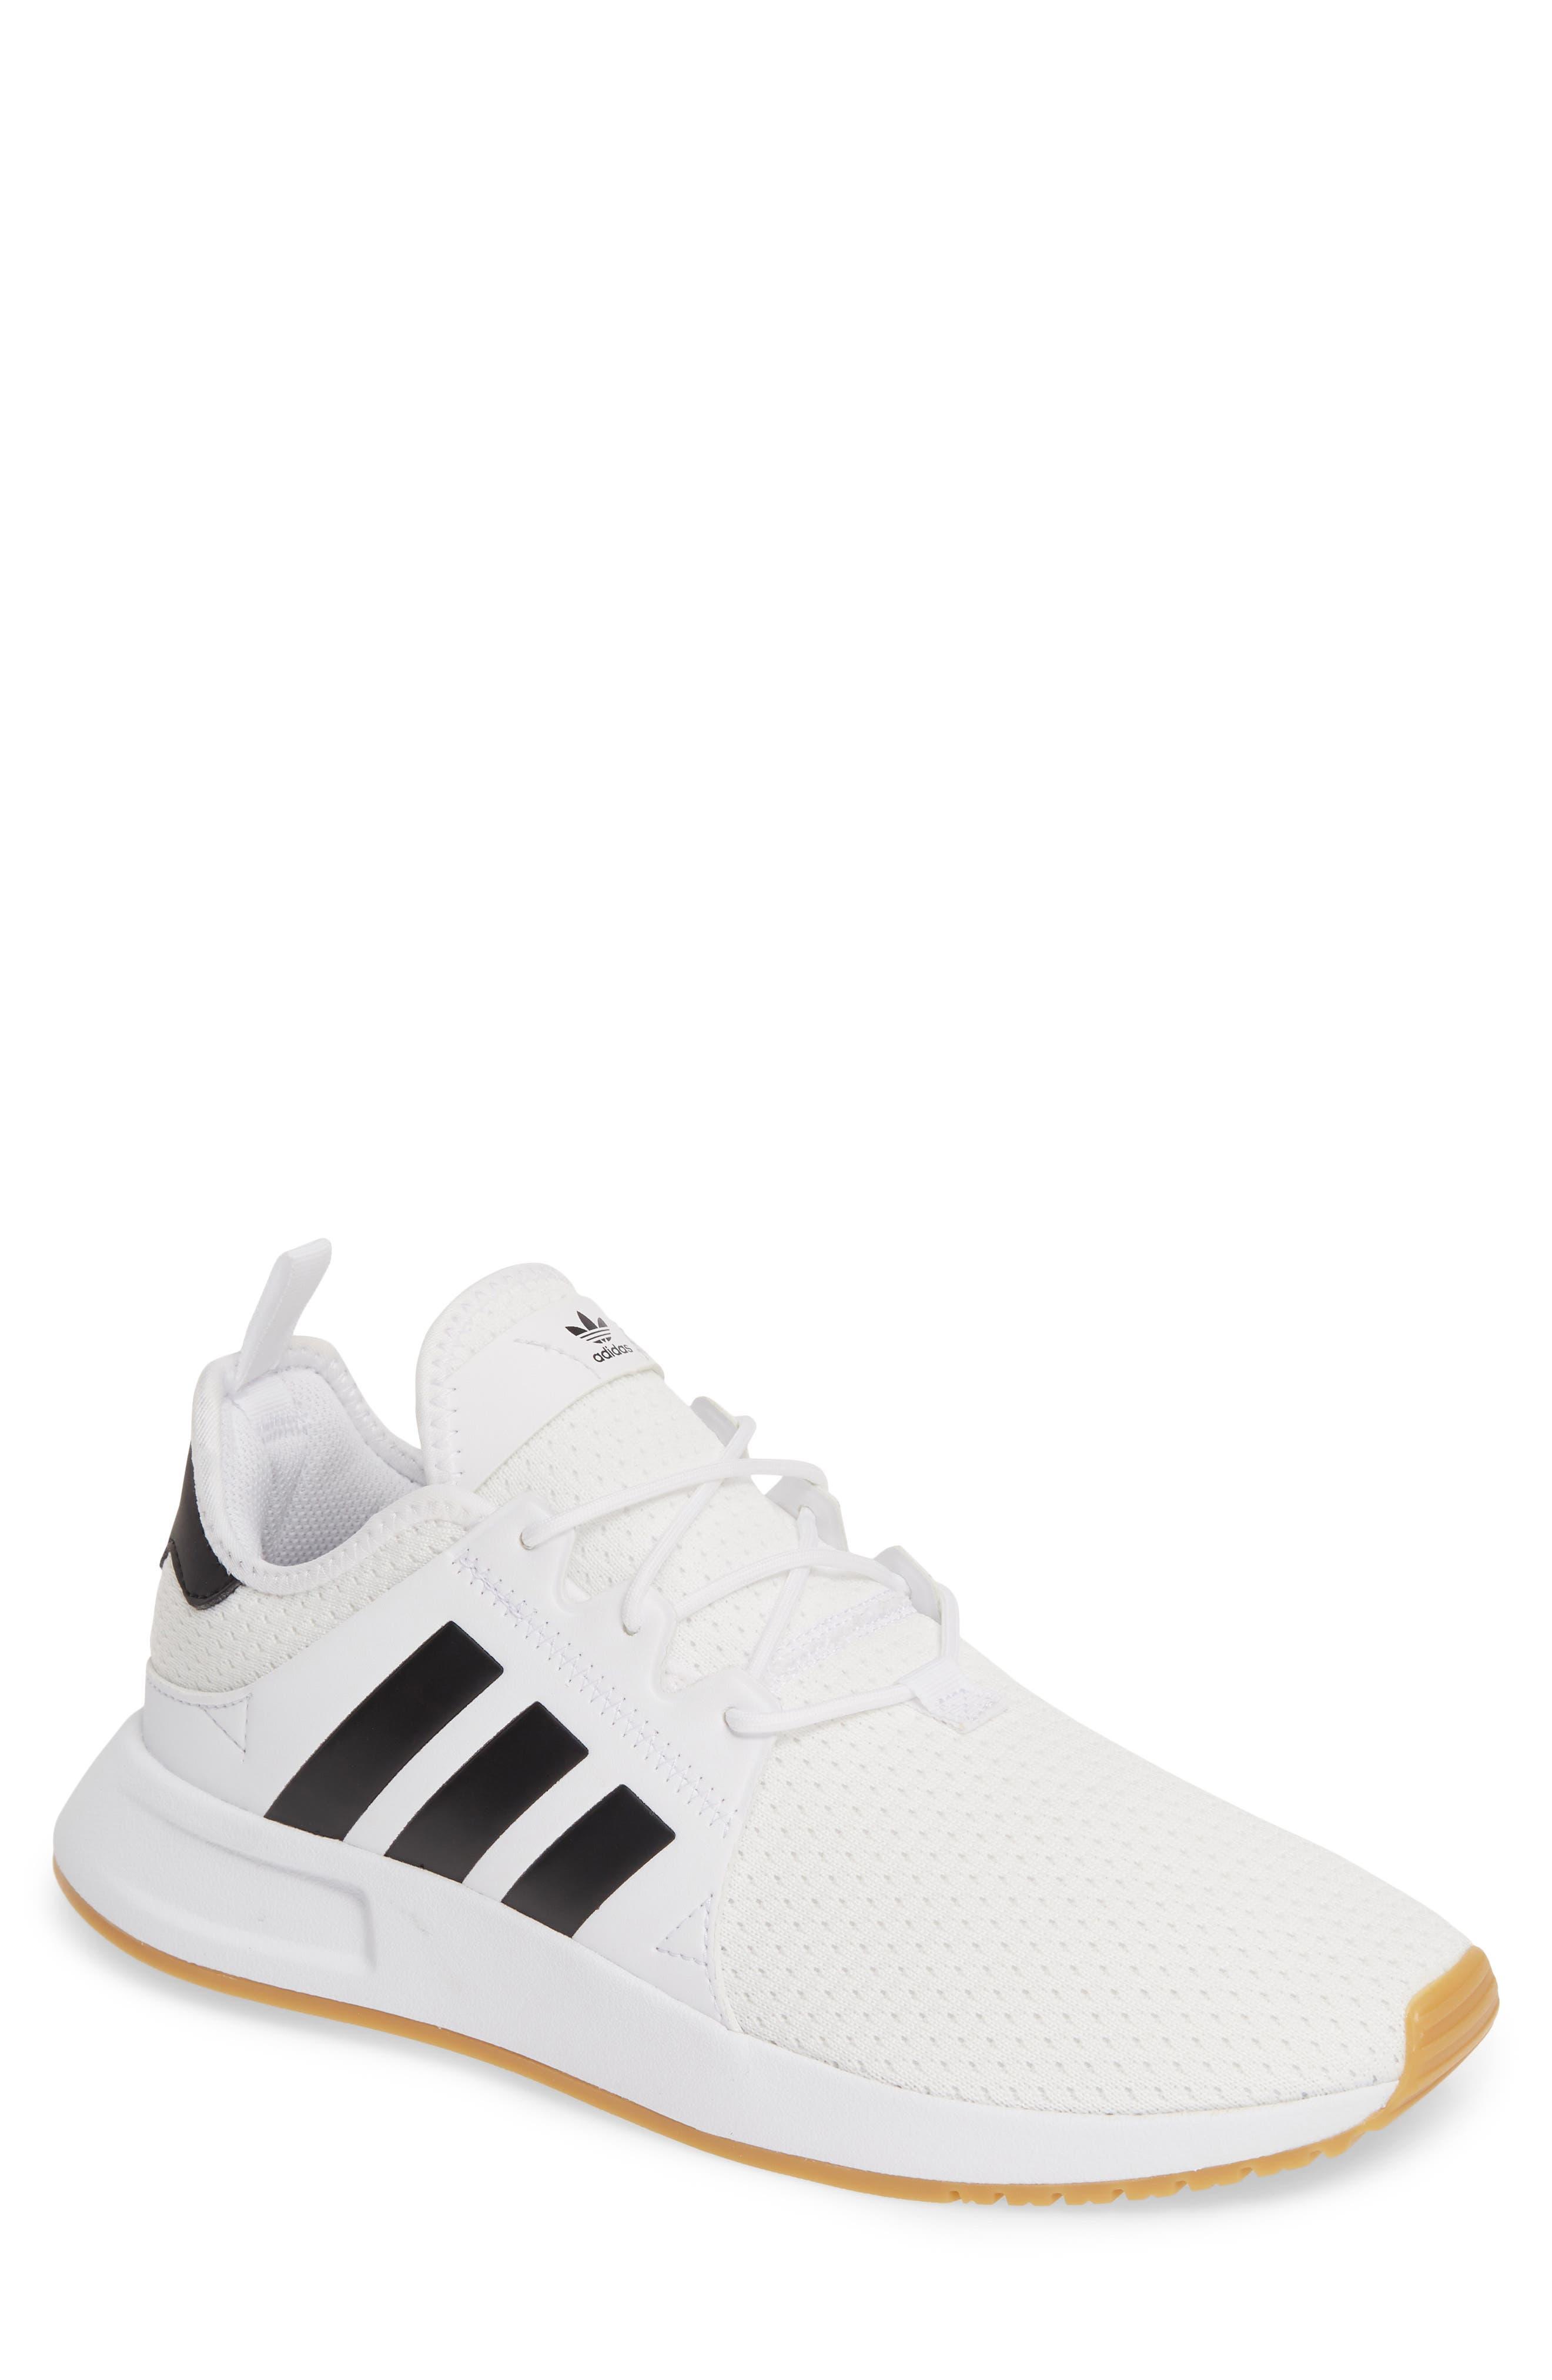 ADIDAS X_PLR Sneaker, Main, color, WHITE/ CORE BLACK/ GUM